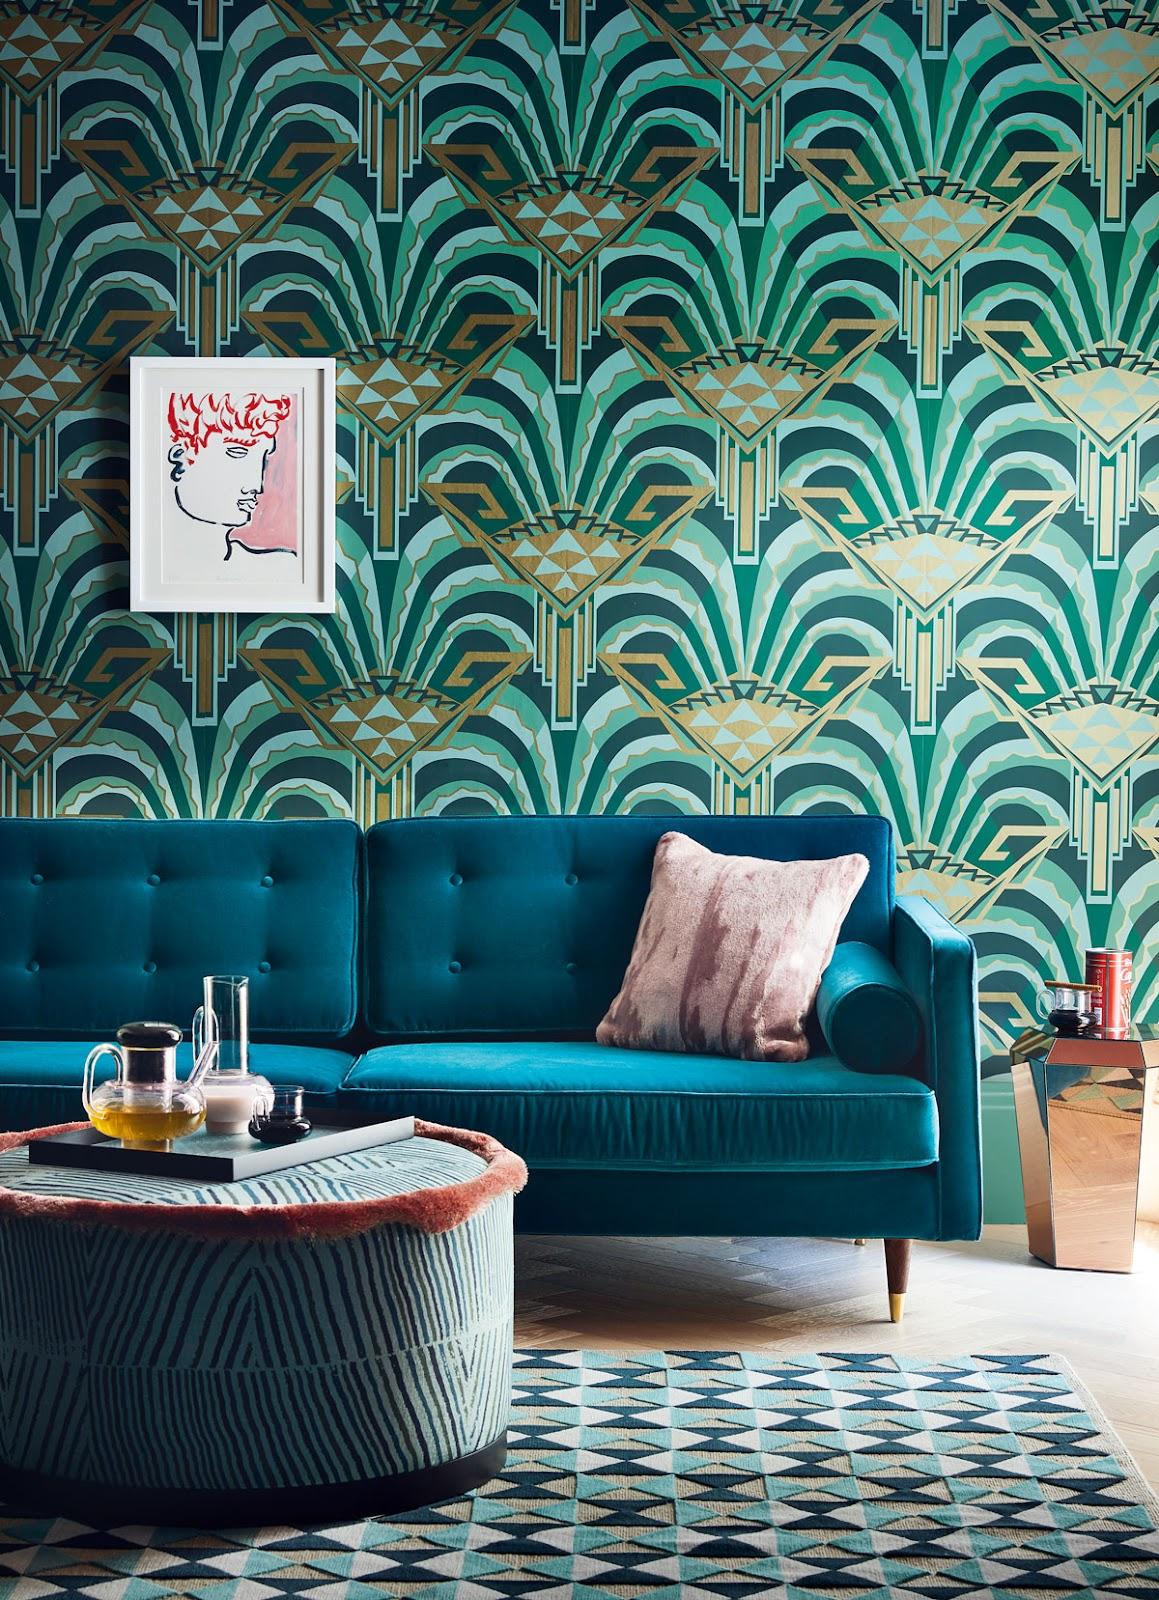 Motif wallpaper pada hunian bergaya art deco - source: pinterest.com